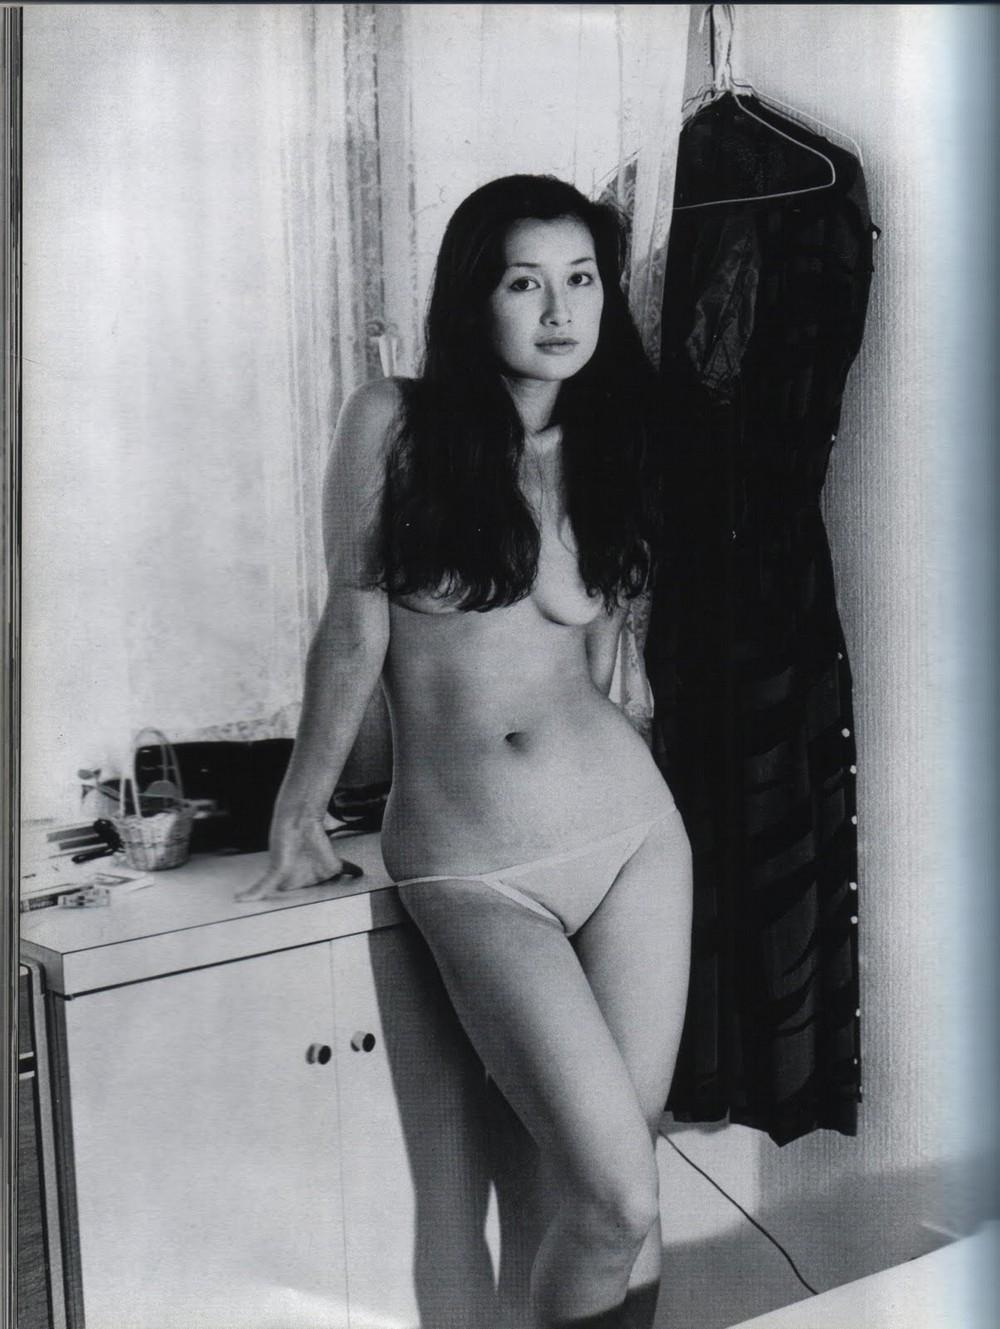 Неоднозначные снимки Нобуеси Араки